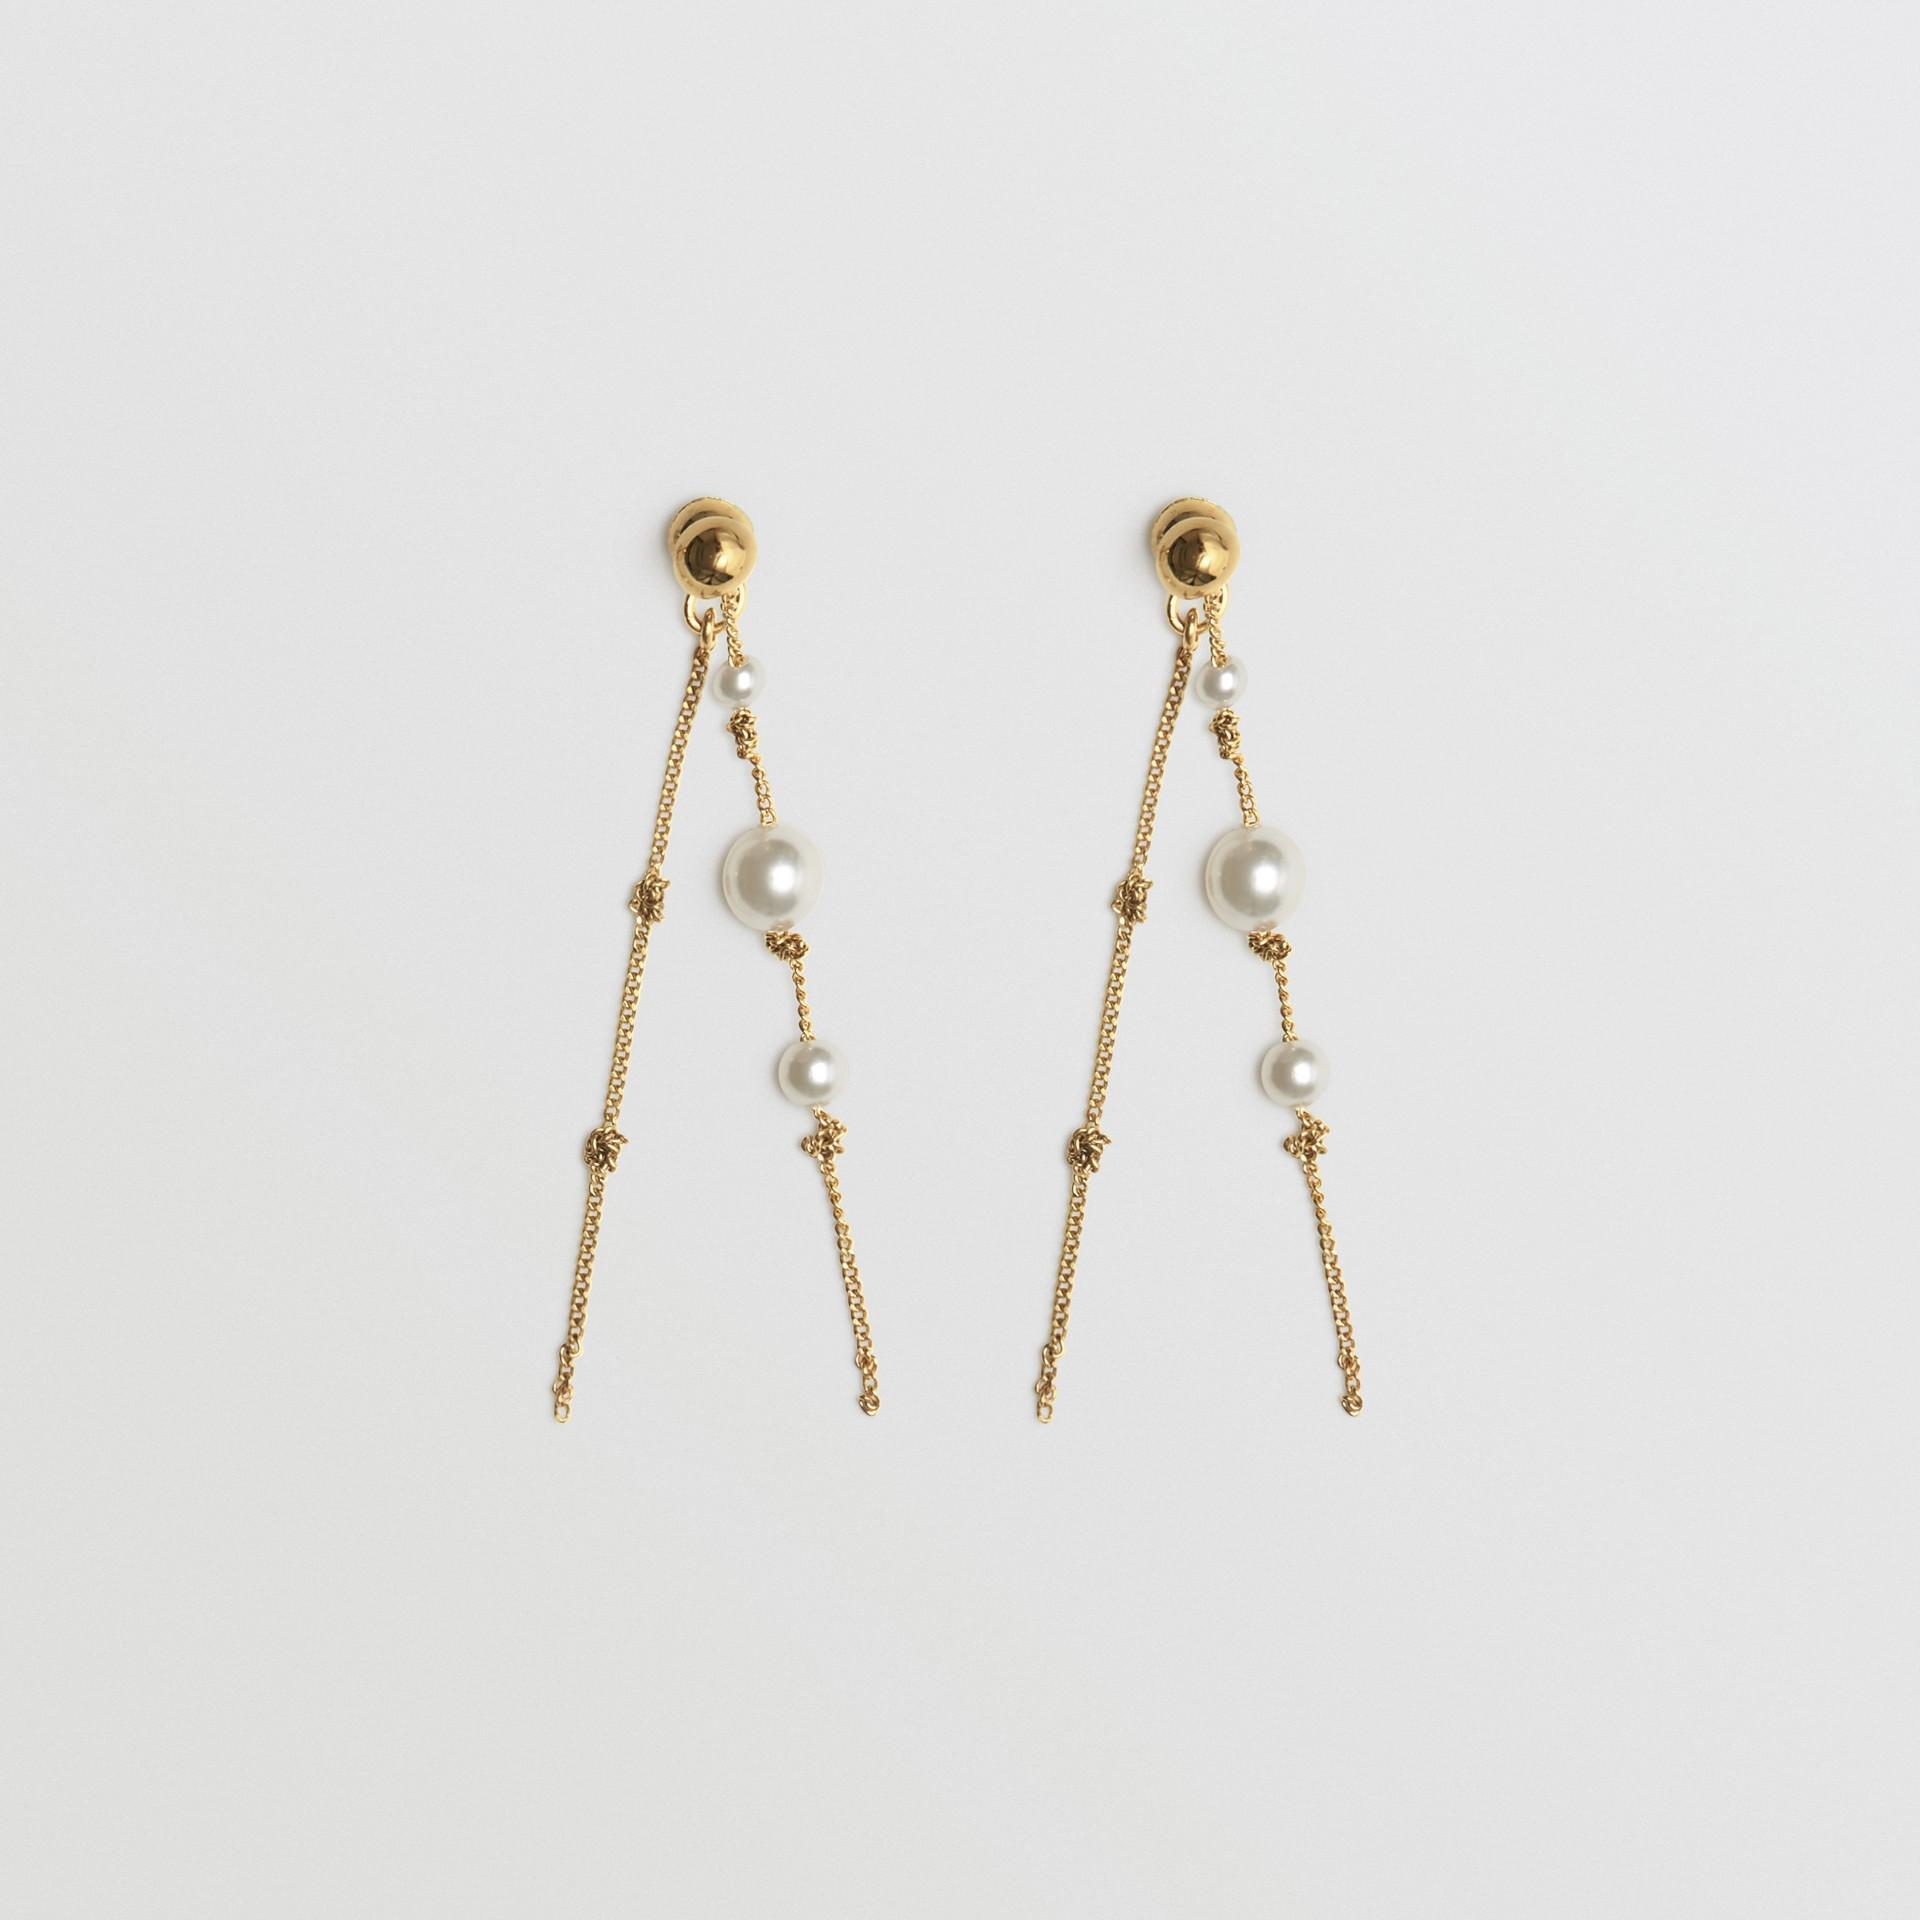 Vergoldete Chandelier-Ohrringe mit Schmuckperlen (Helles Goldfarben) - Damen | Burberry - Galerie-Bild 0